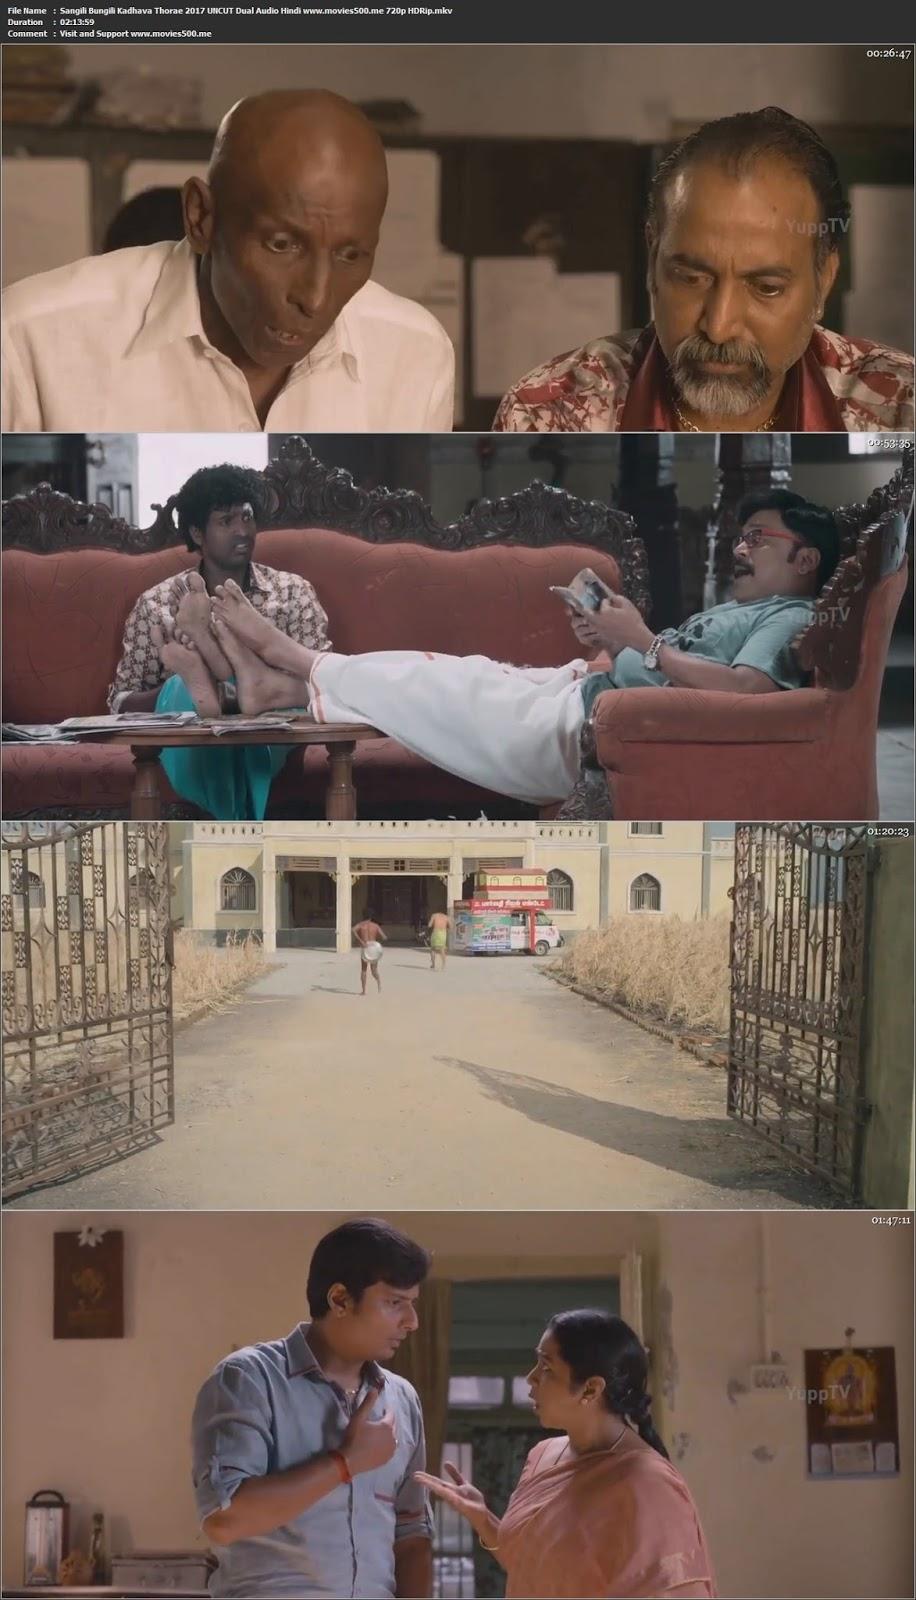 Sangili Bungili Kadhava Thorae 2017 Hindi Dubbed 400MB HDRip 480p at movies500.me